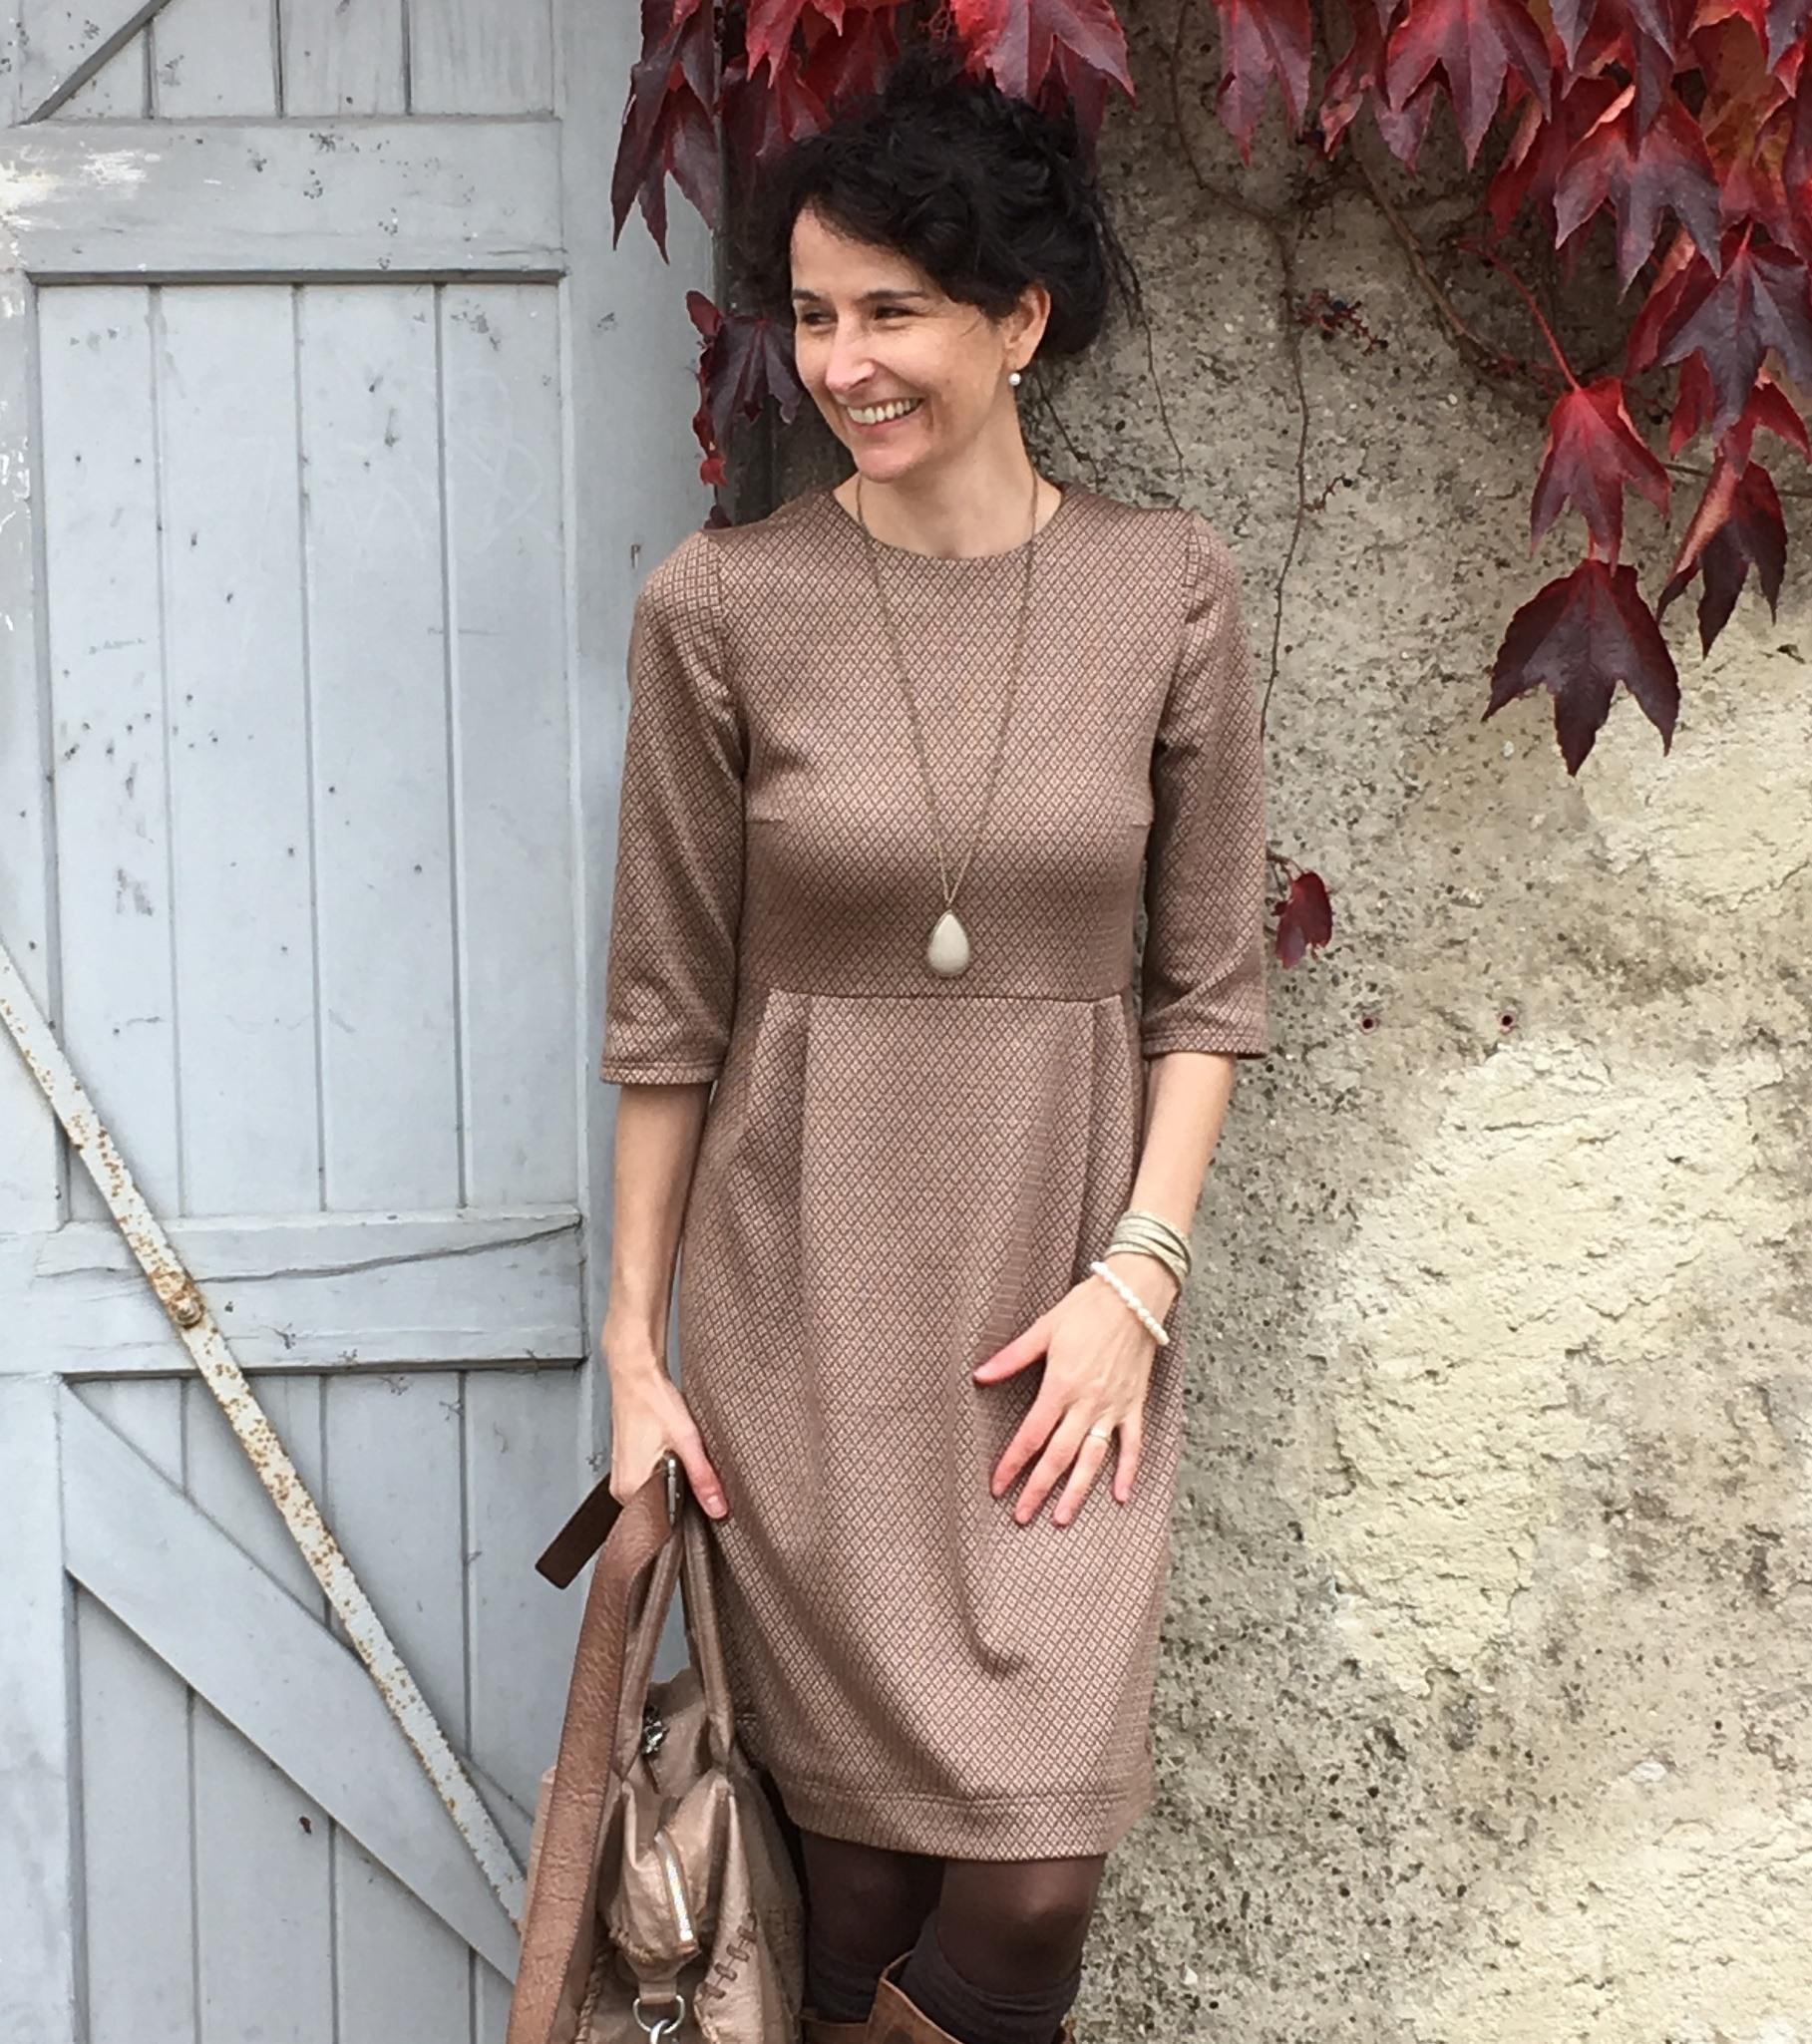 formal-genial-herbst-kleider-damen-fur-2019